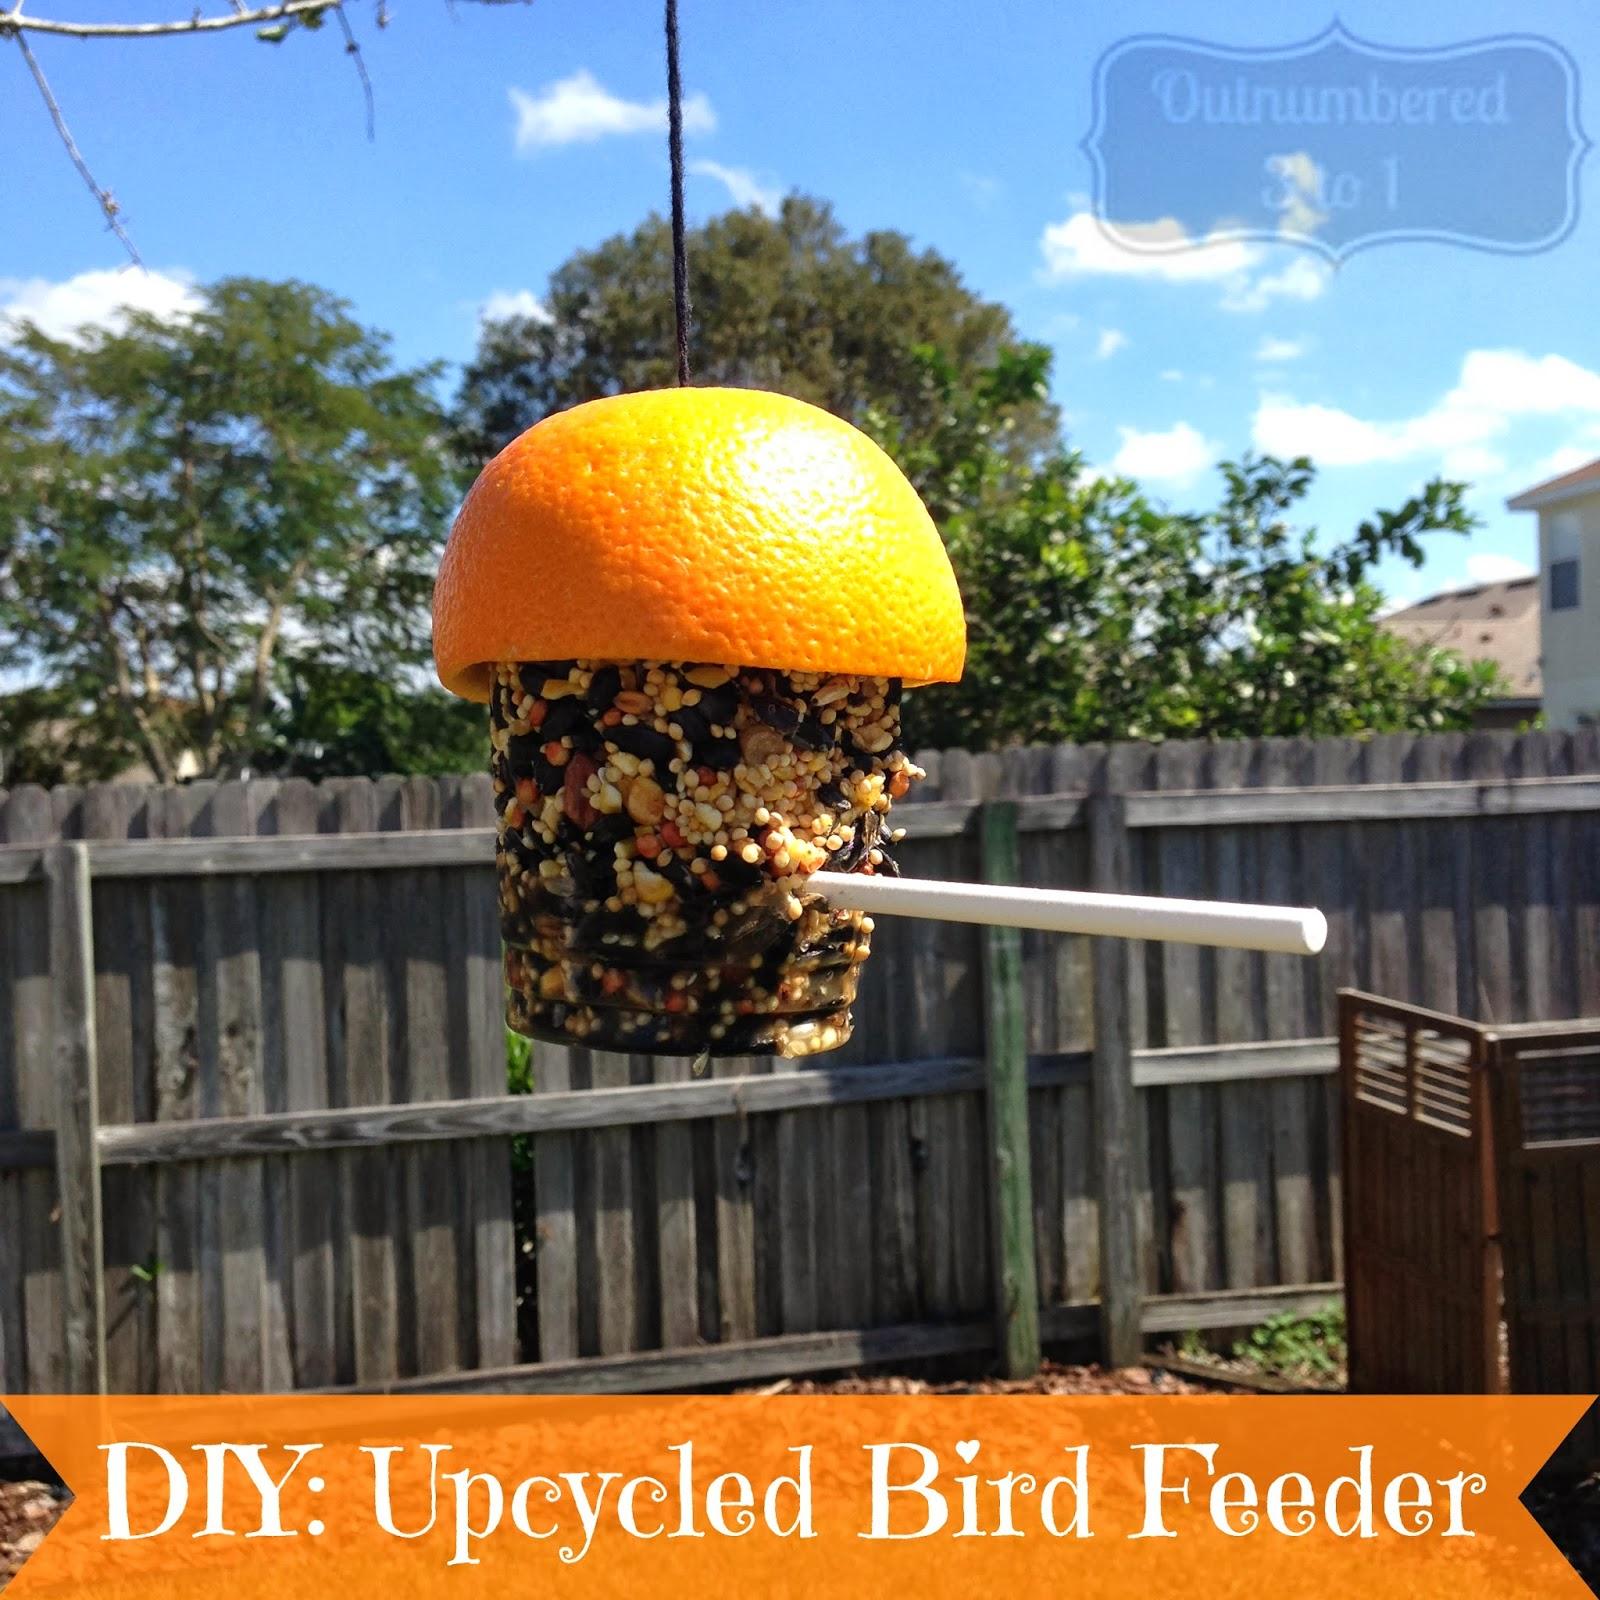 DIY: Upcycled Bird Feeder